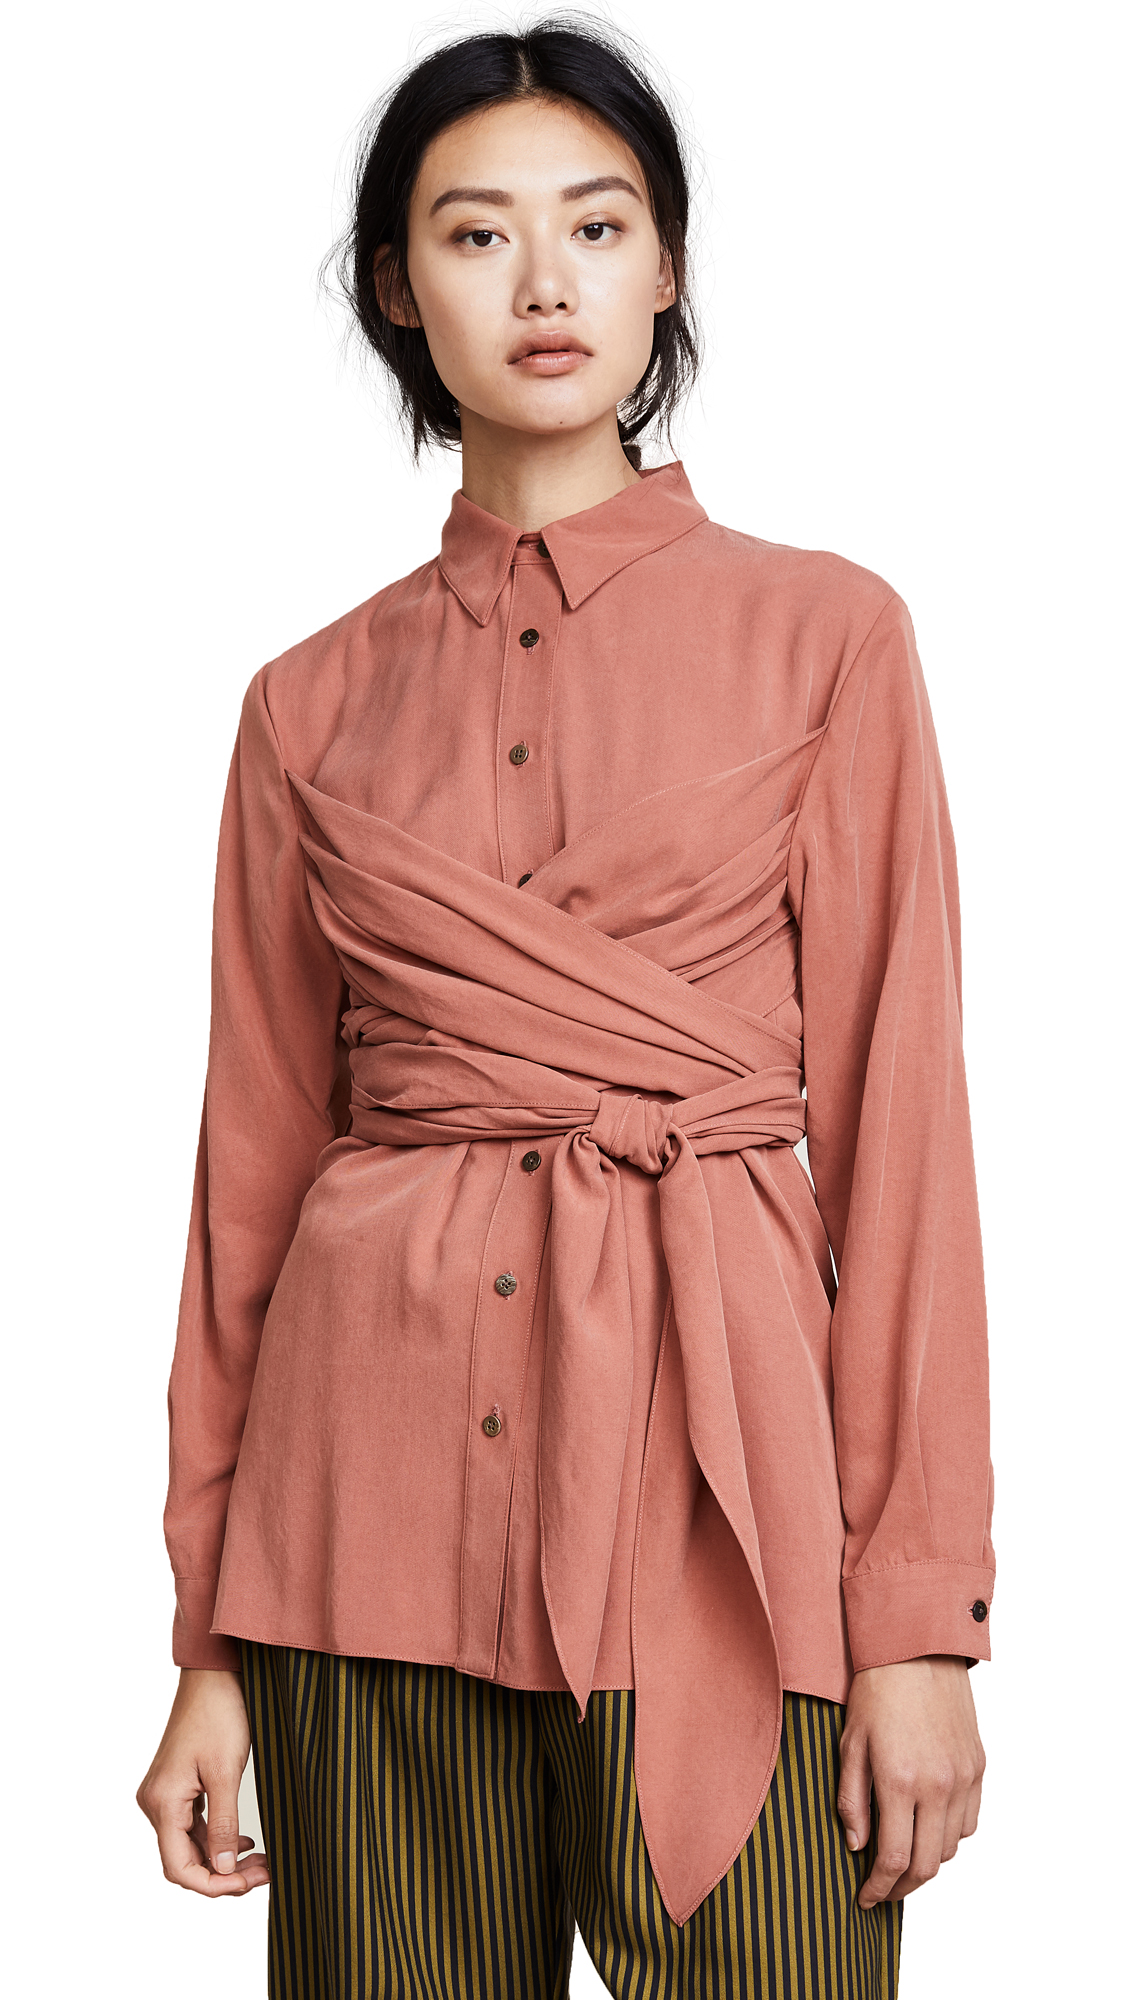 Mara Hoffman Ella Shirt - Rust